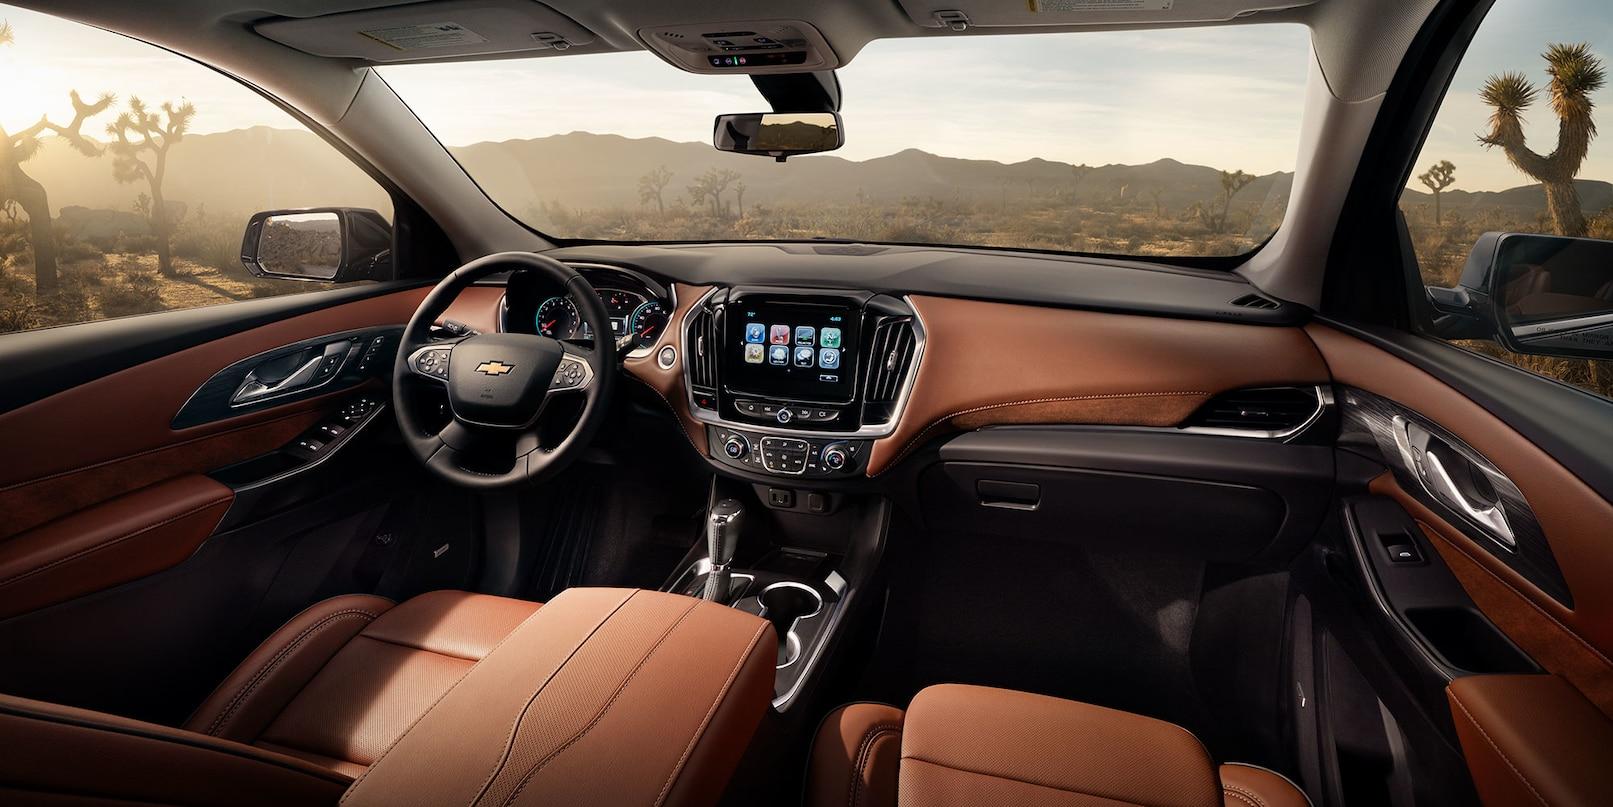 2019 Chevrolet Traverse Center Console